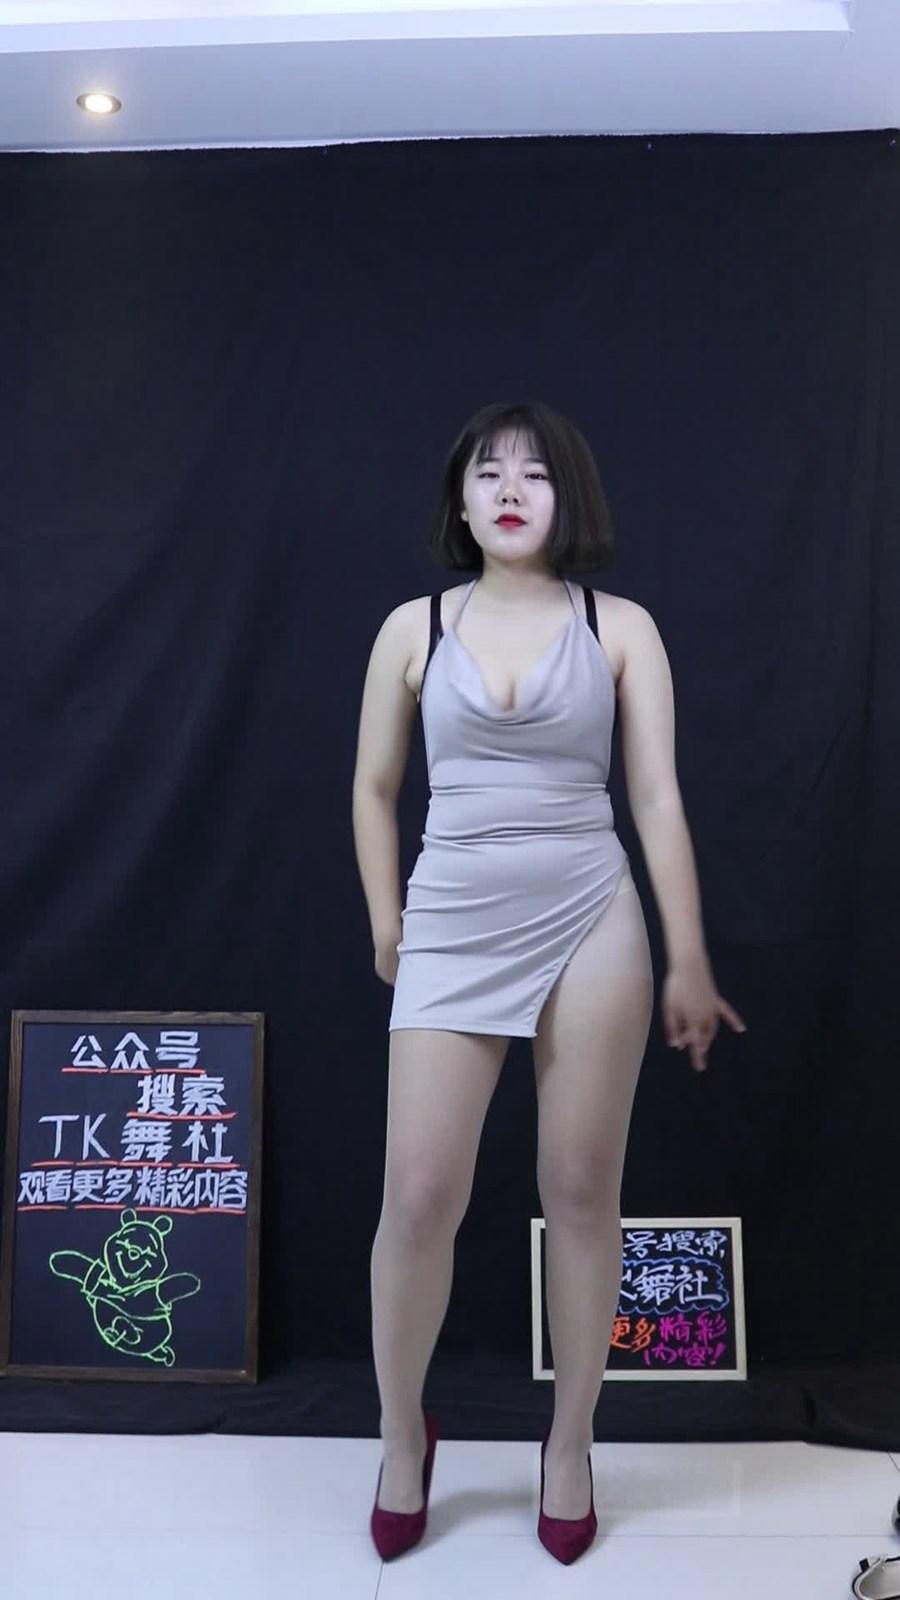 TK舞社 TK舞社 (86)